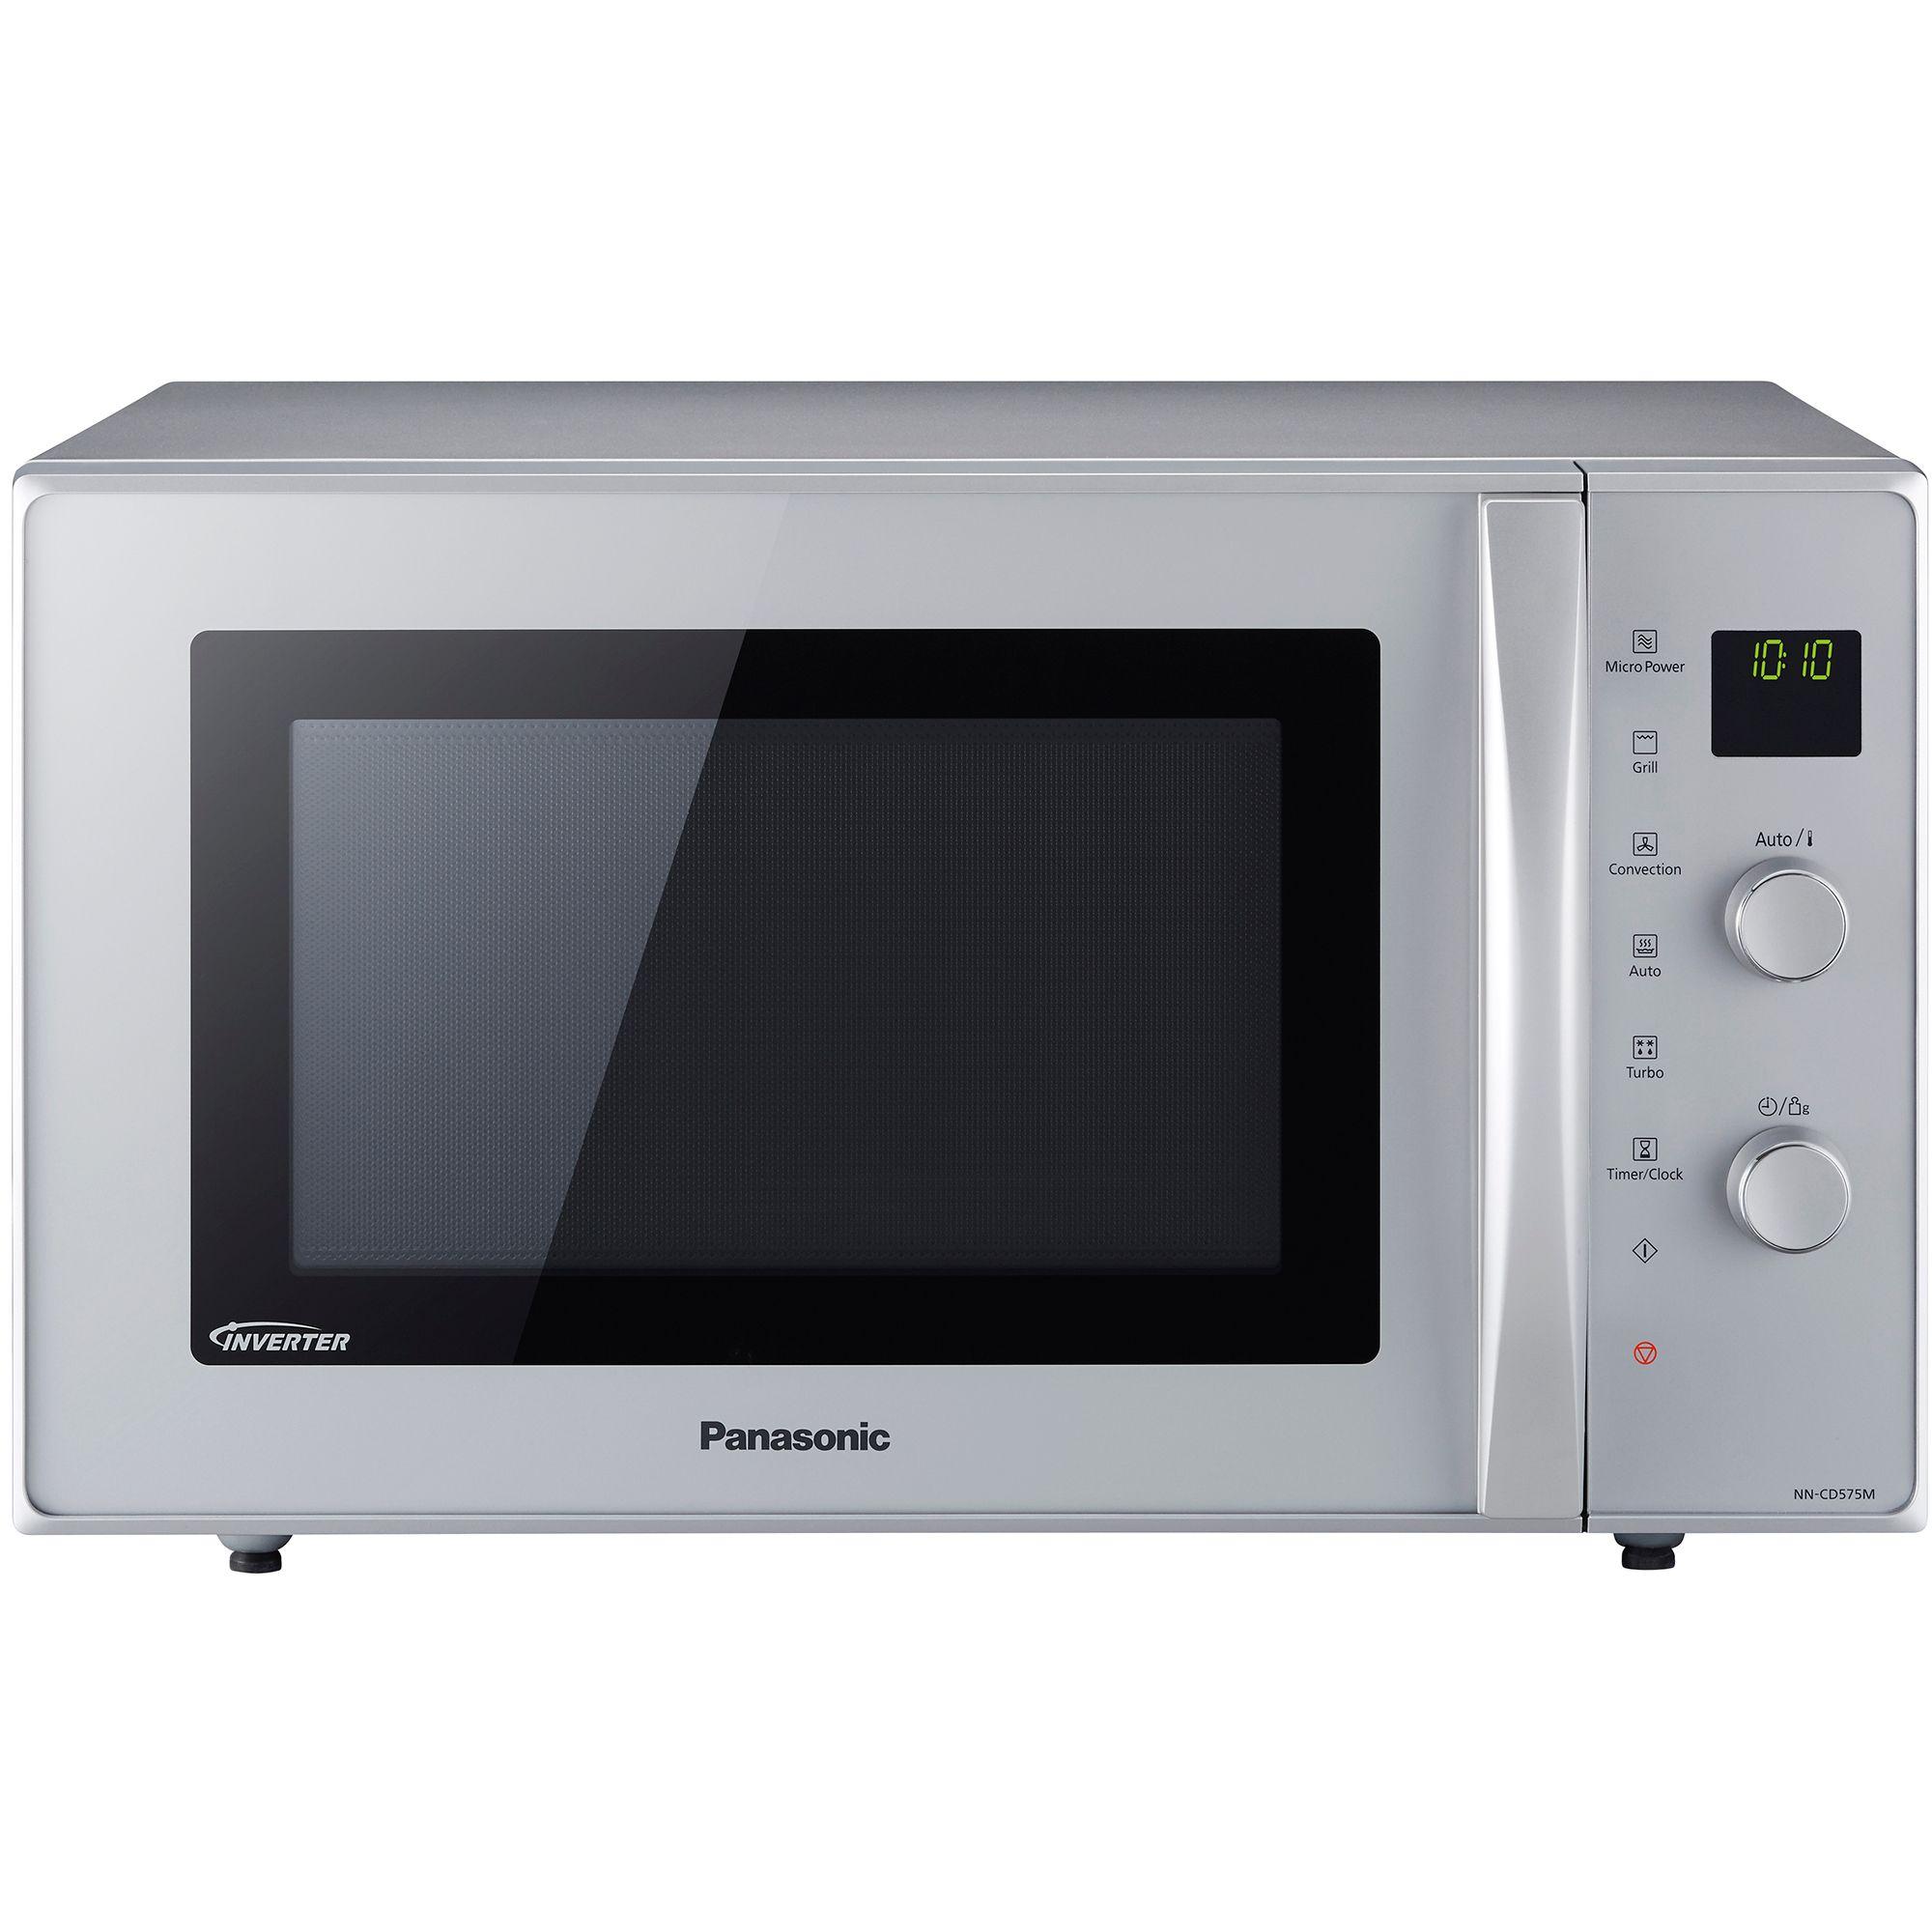 Cuptor cu microunde Panasonic NN-CD575MEPG 1000W Digital Grill Argintiu